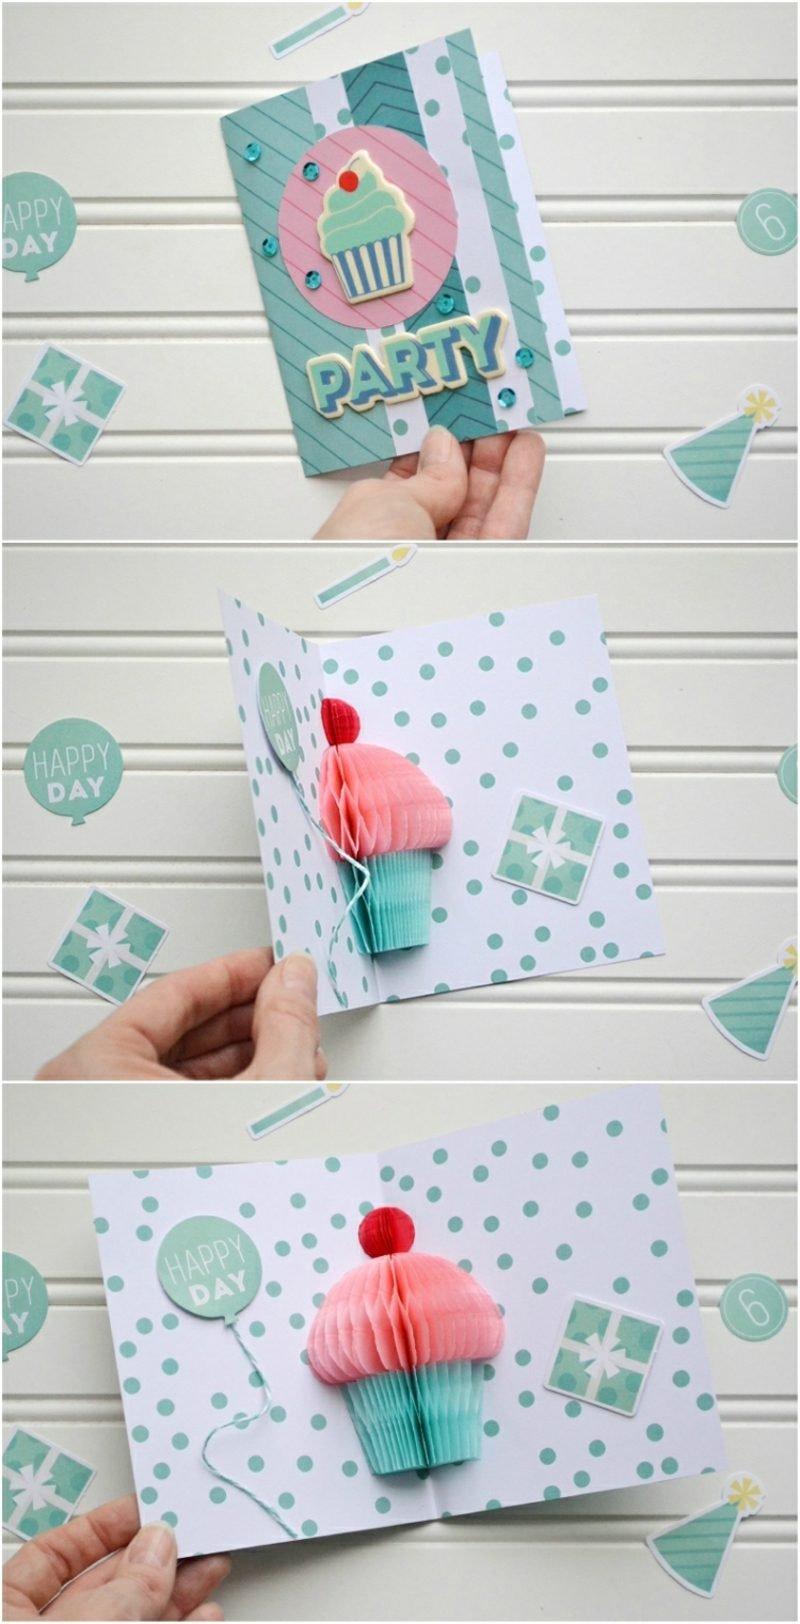 Lustige Gebutstagskaten basteln Pop up Karte mit Cupcake